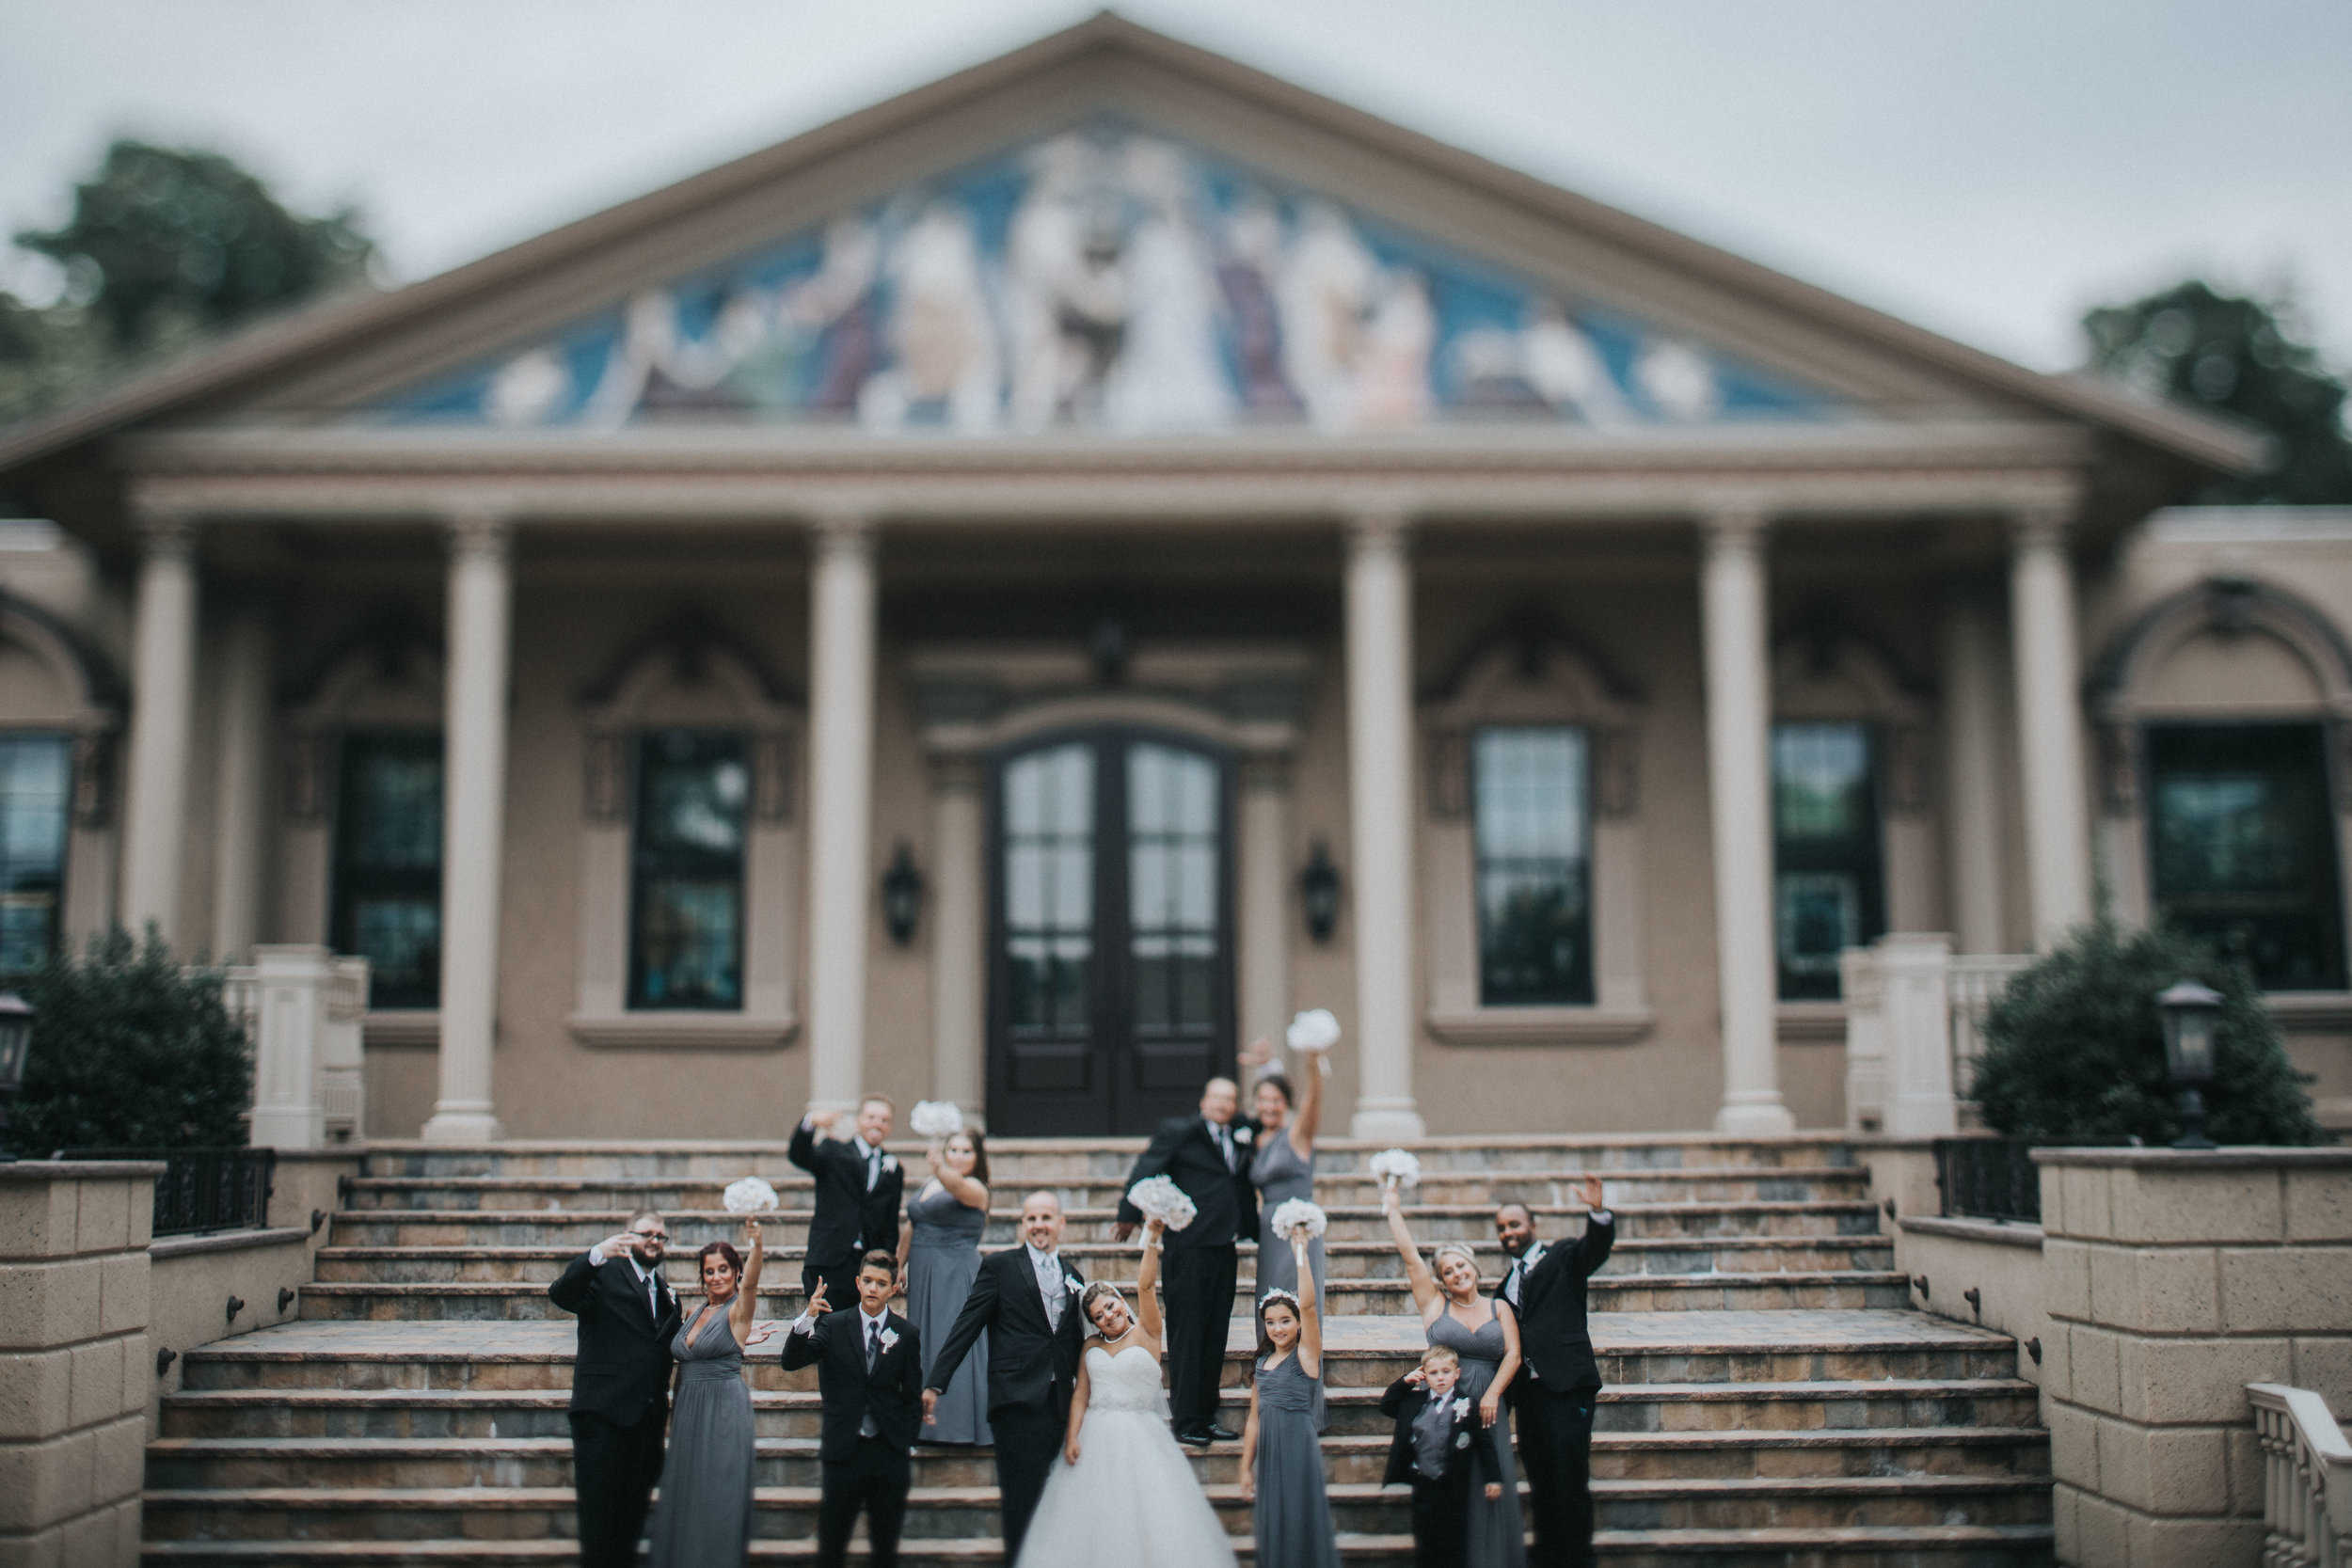 NewJersey_Wedding_Photography_Brigalias_Bridal_Party_Tara&Pete-54.jpg